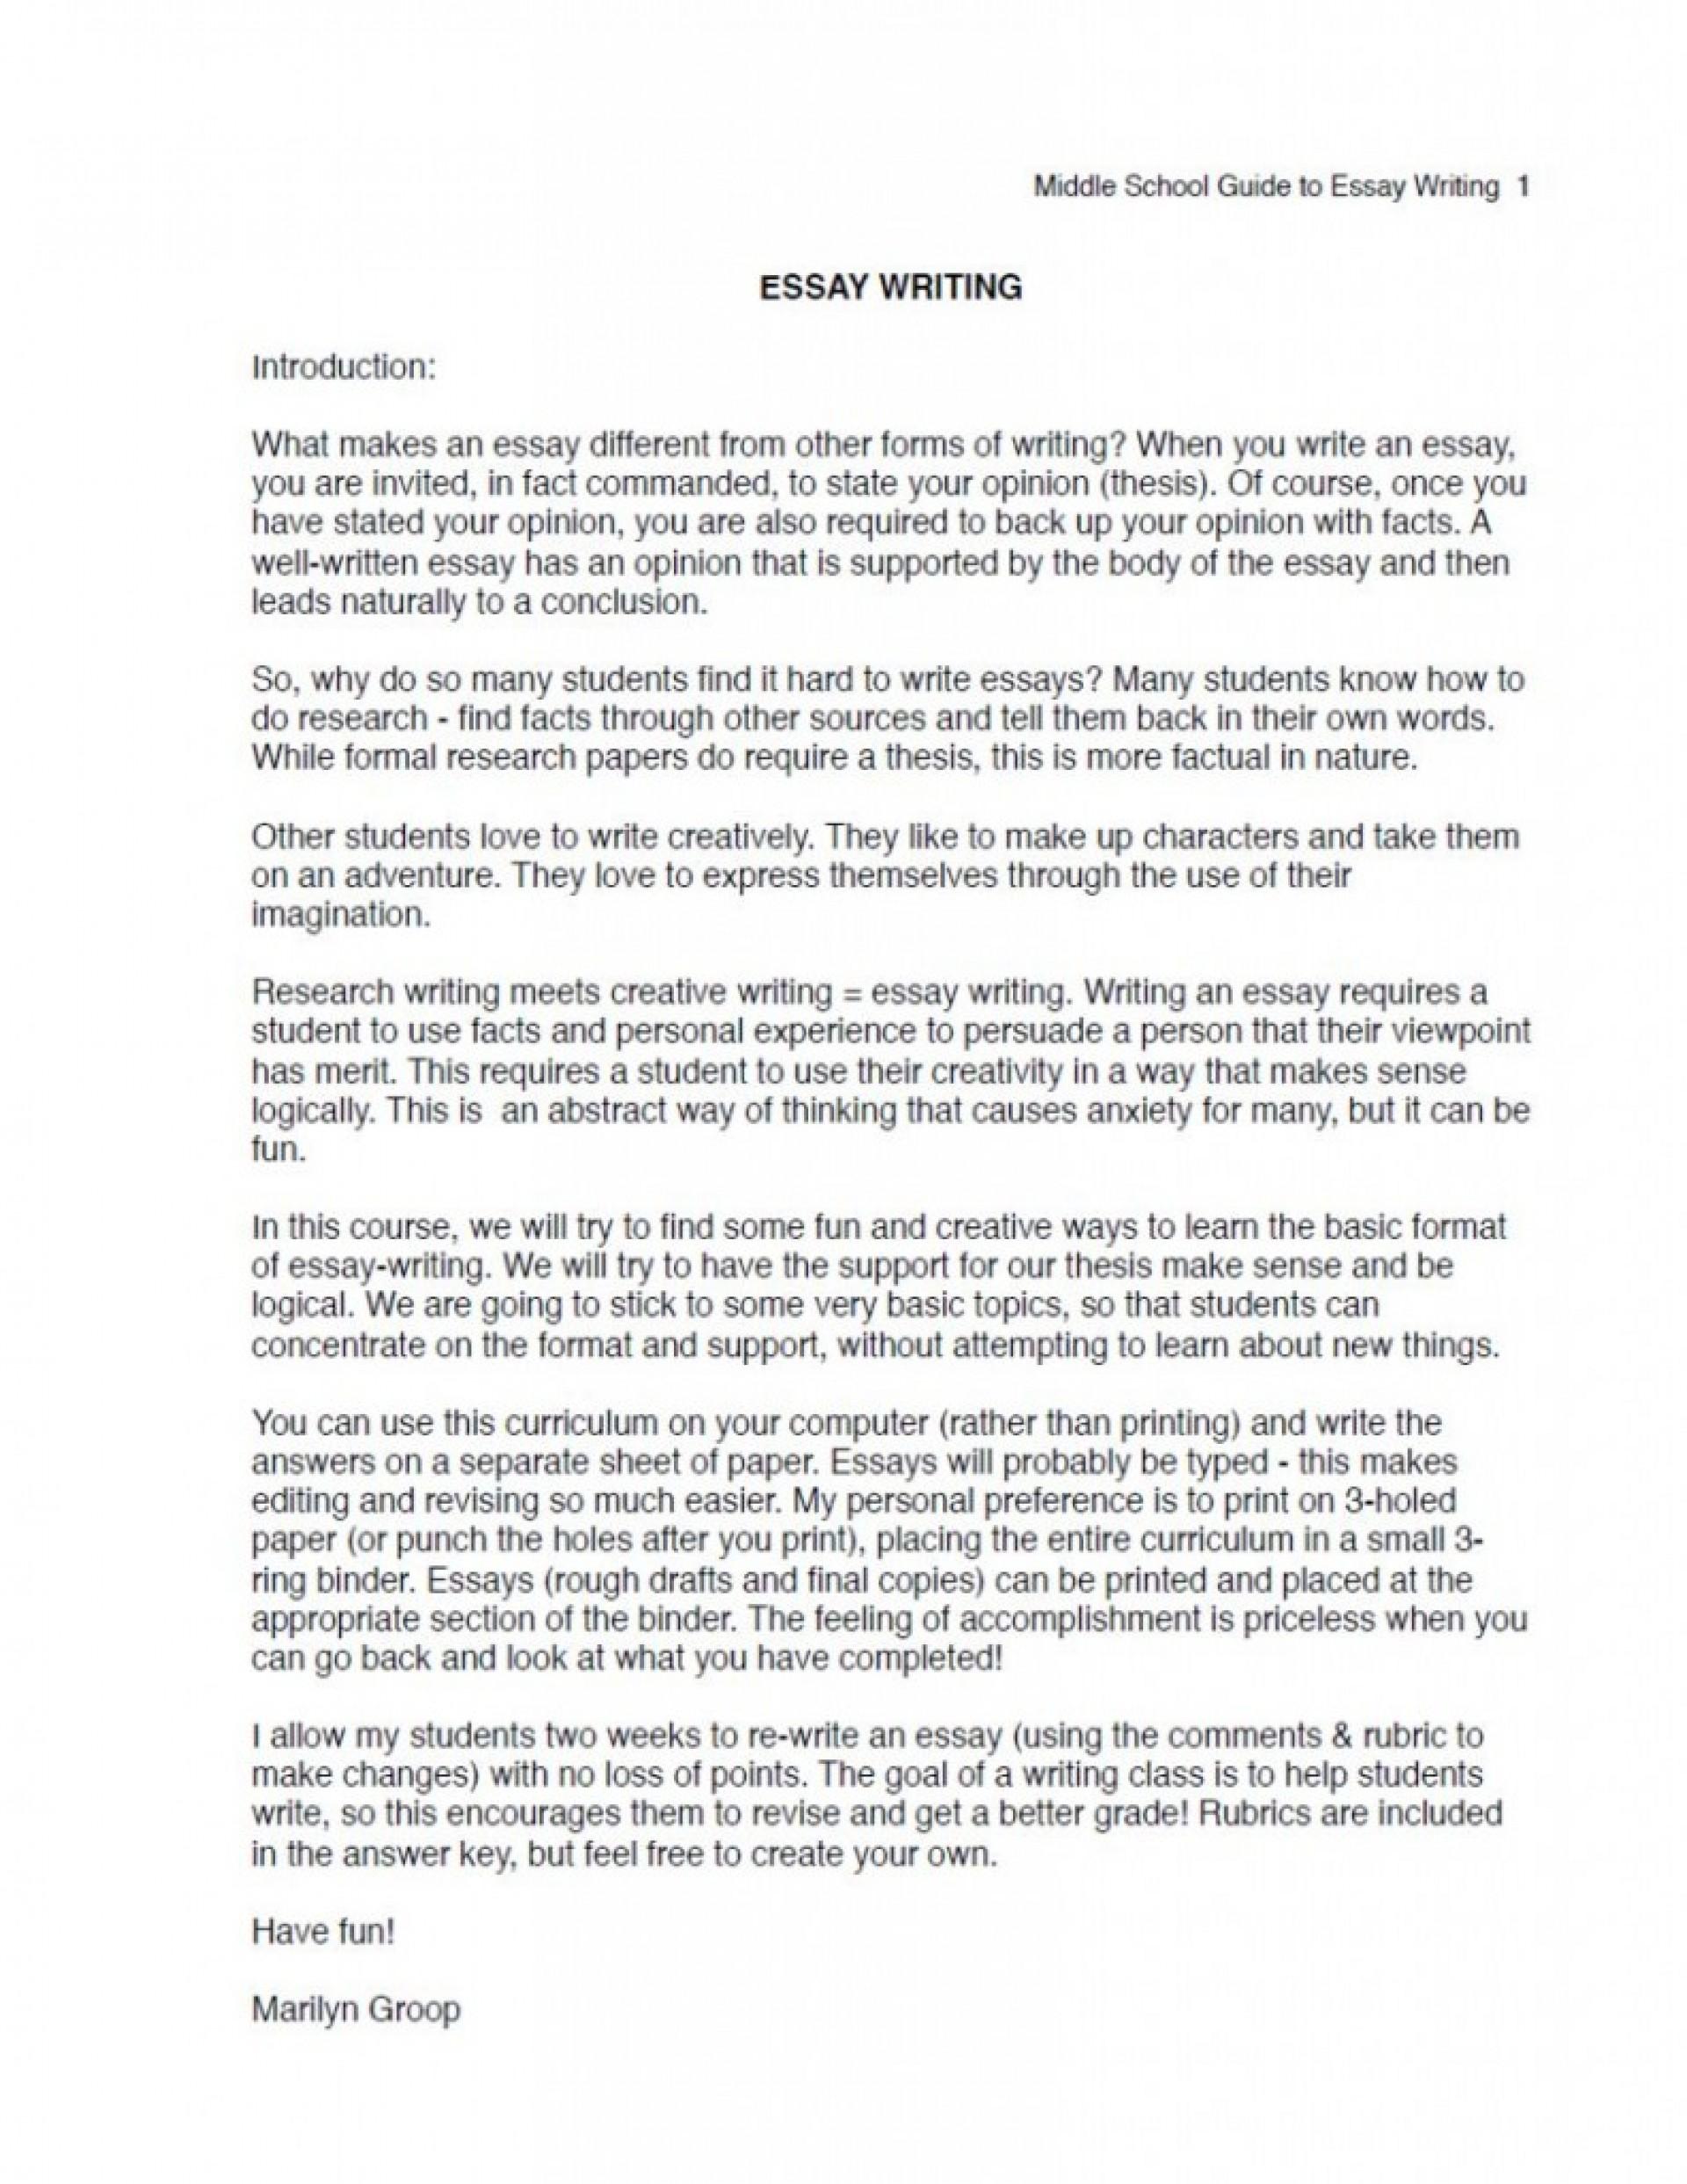 002 Essay On School Example Ms Excerpt Excellent Florida Shooting Uniform Is Necessary 1920